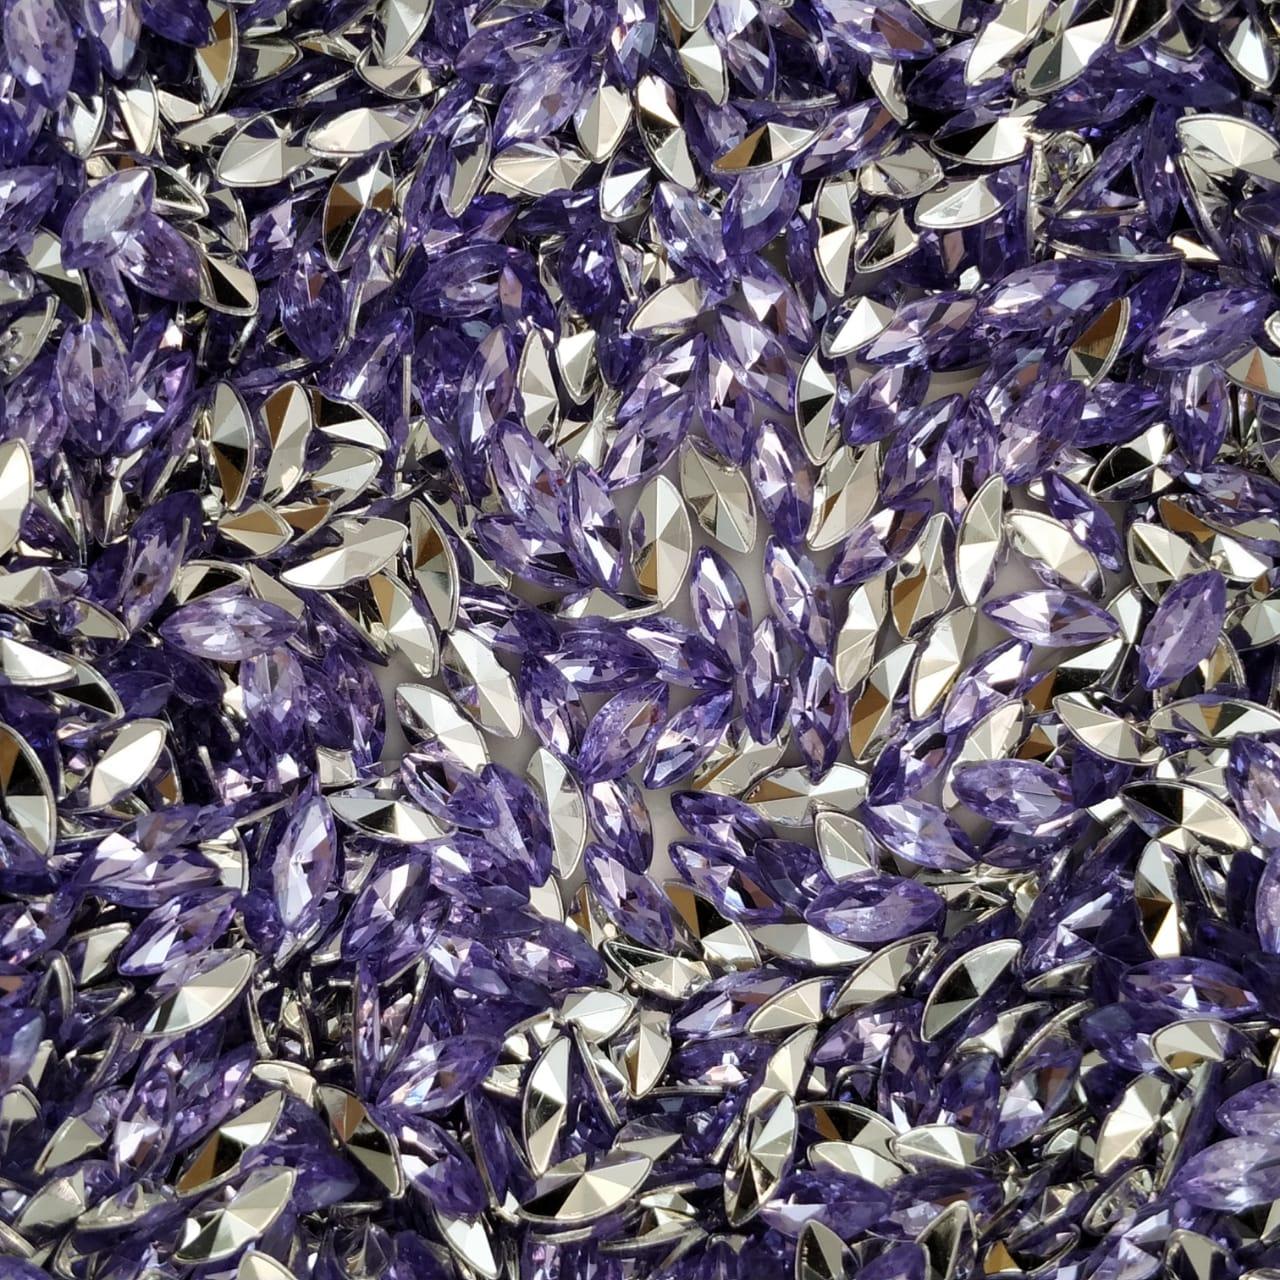 CHT1759 - Chaton Navete Violet 3x6 - 20unids